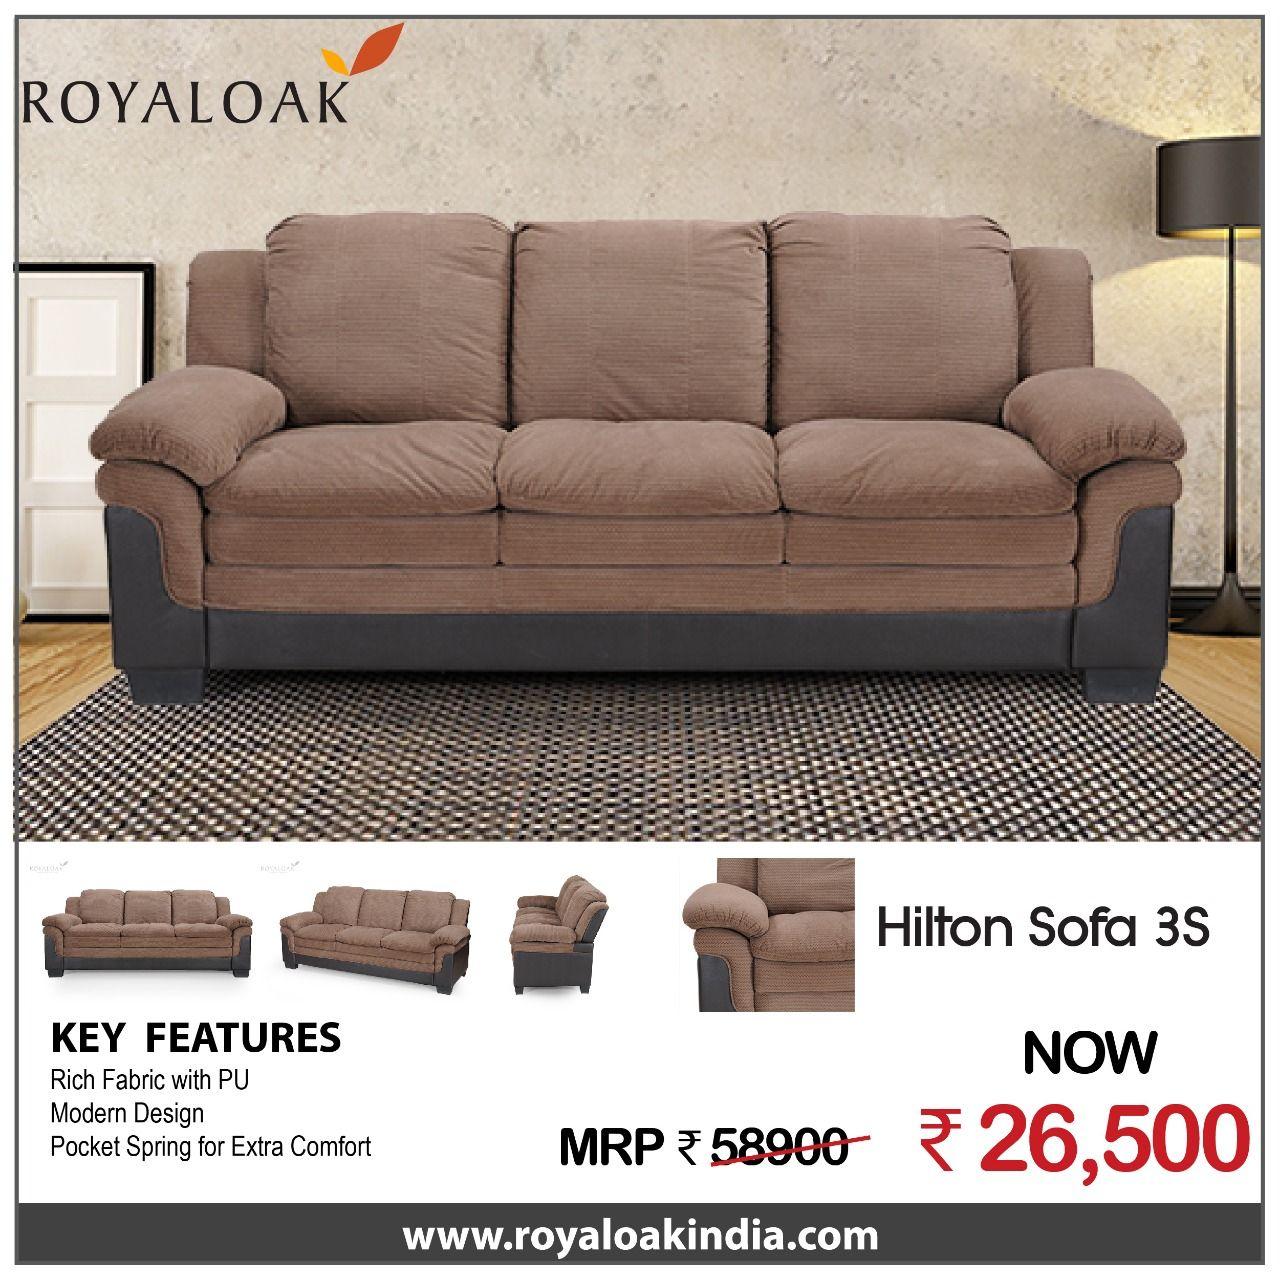 Pin By Royaloak Furniture On Royaloak Single Seater Sofas Buy Sofa Online Sofa Online Single Seater Sofa